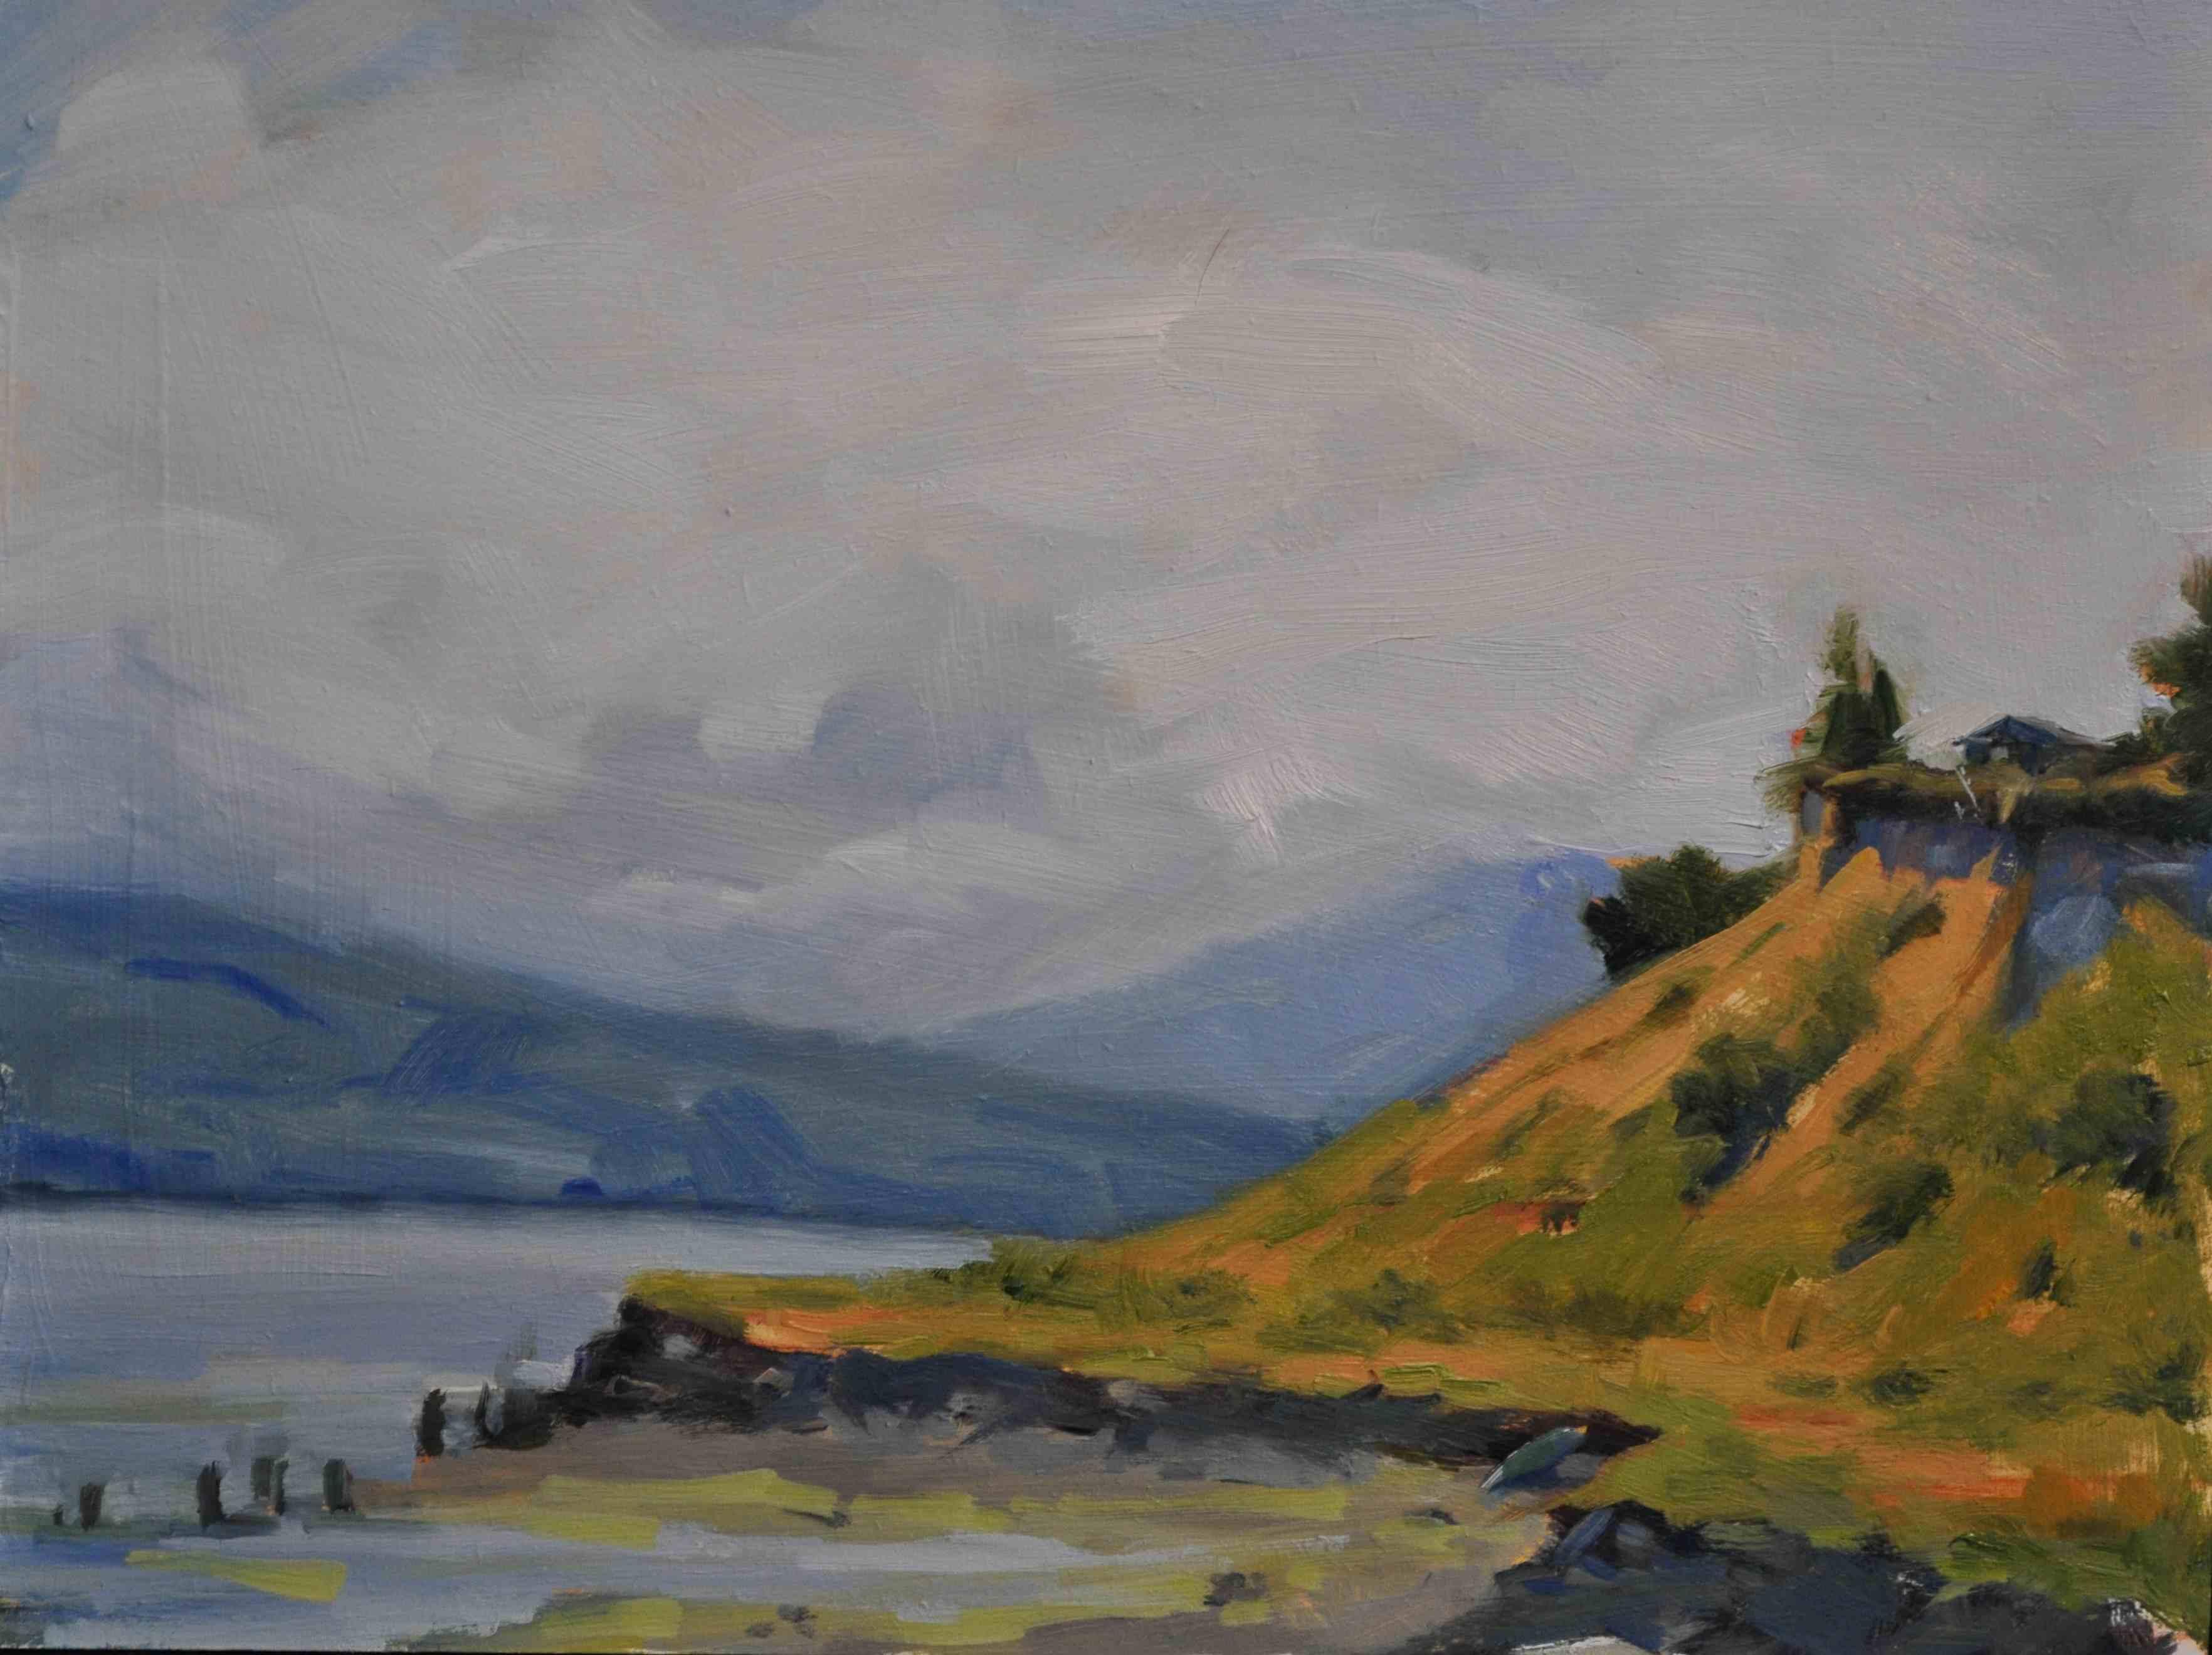 """'Port Townsend Cliff oil/board 9x12"" original fine art by Emiliya Lane"